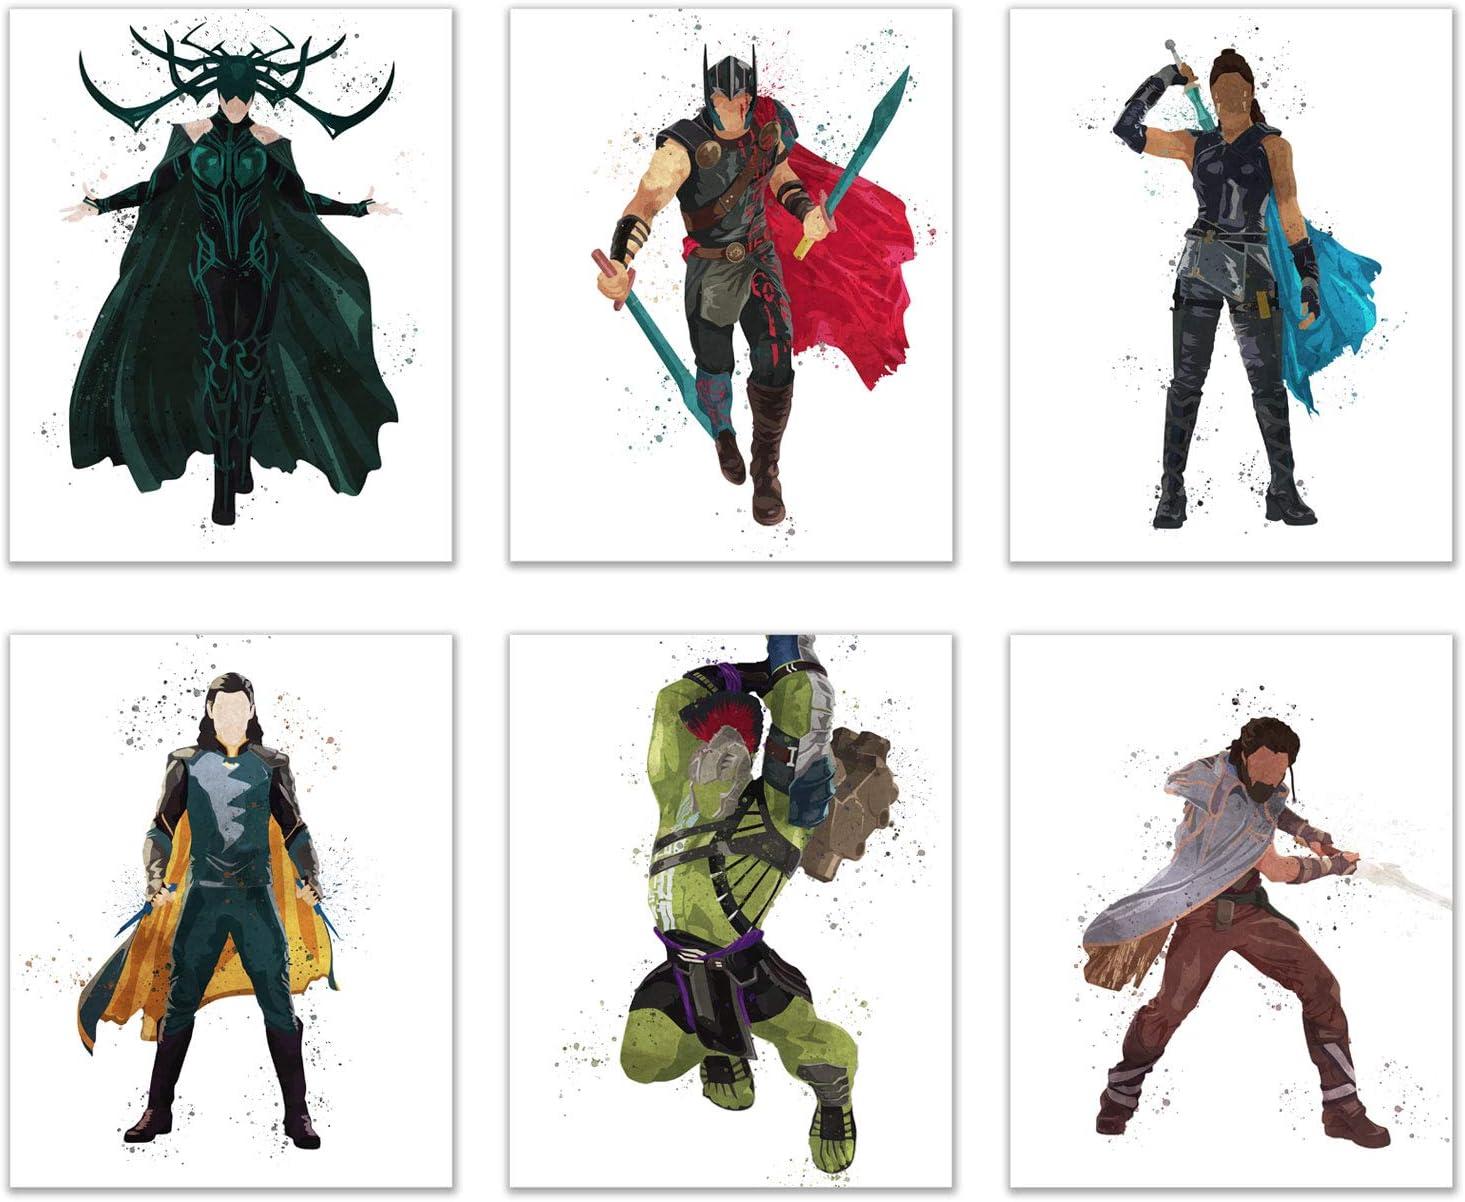 Watercolor Thor: Ragnarok Prints - Set of 6 (8x10) Glossy Comic Wall Art Decor - Thor - Hela - Hulk - Valkyrie - Loki - Heimdall